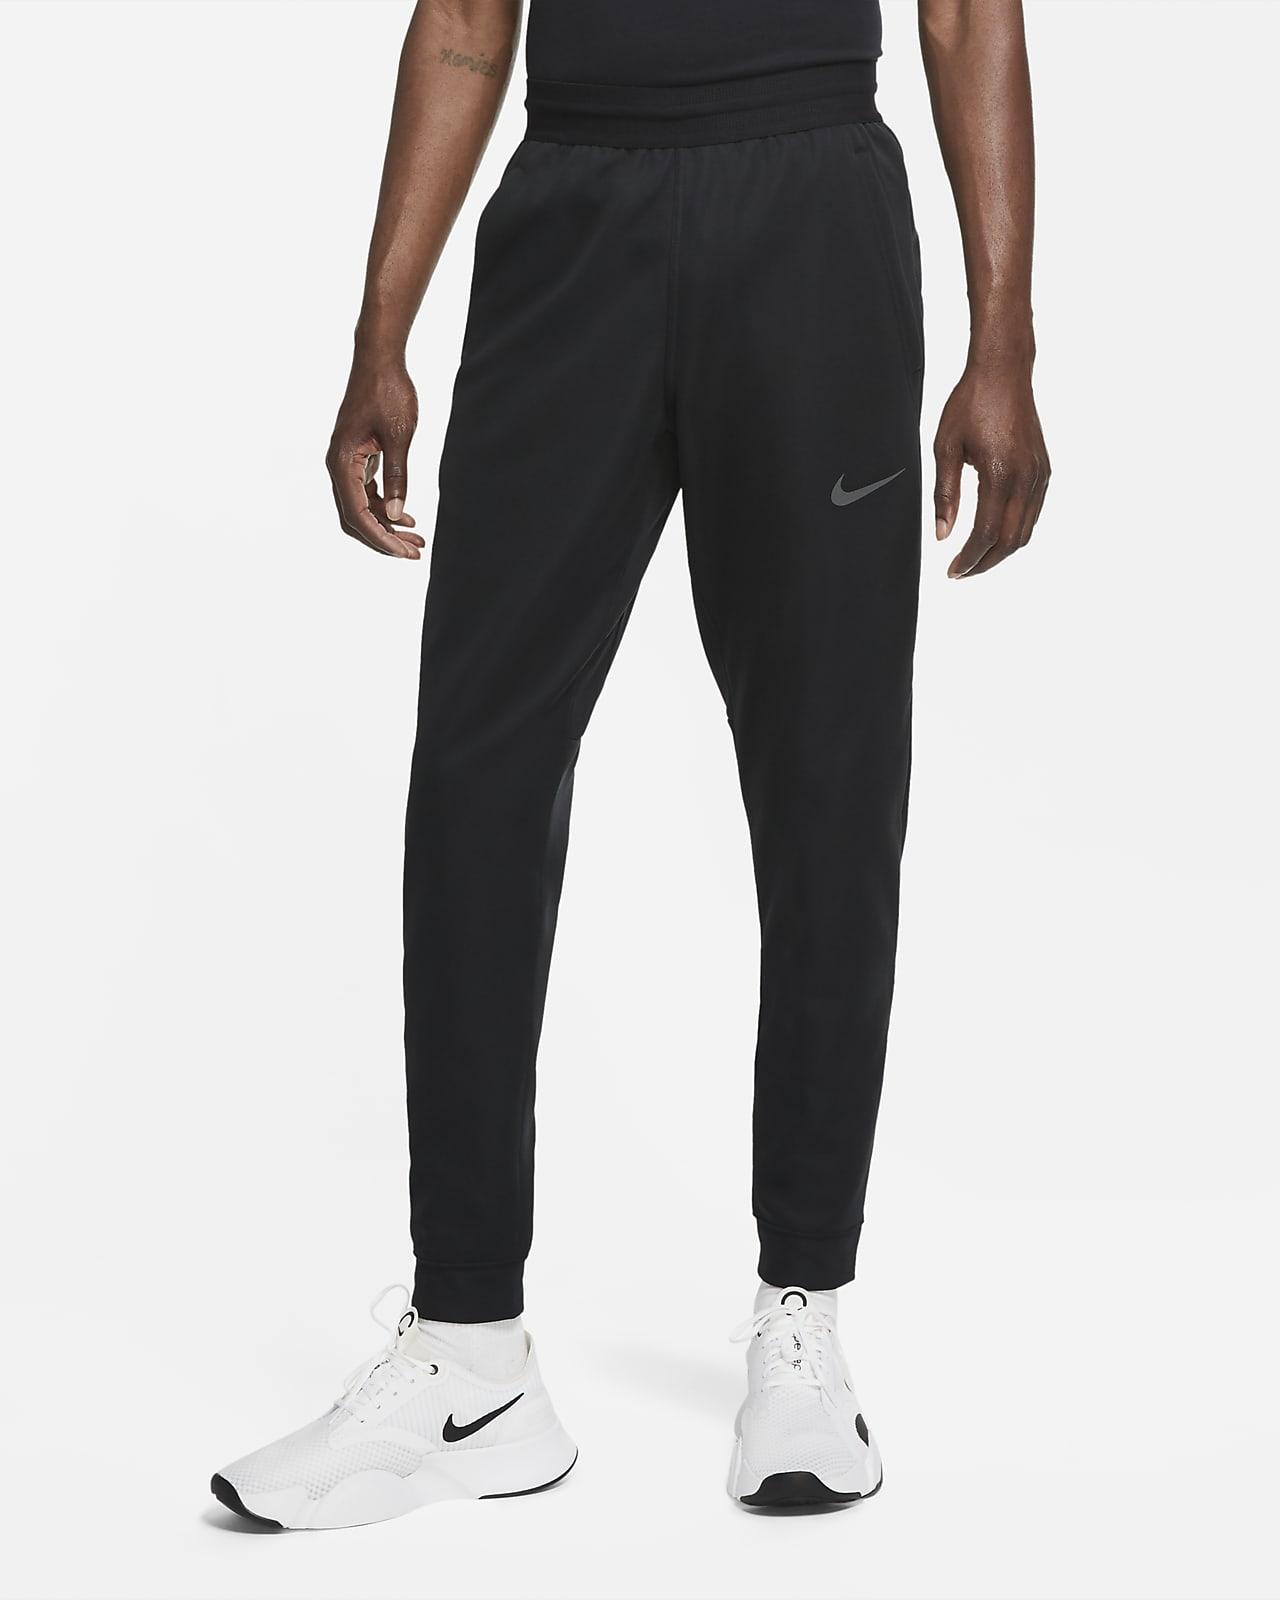 Nike Therma Herren-Trainingshose